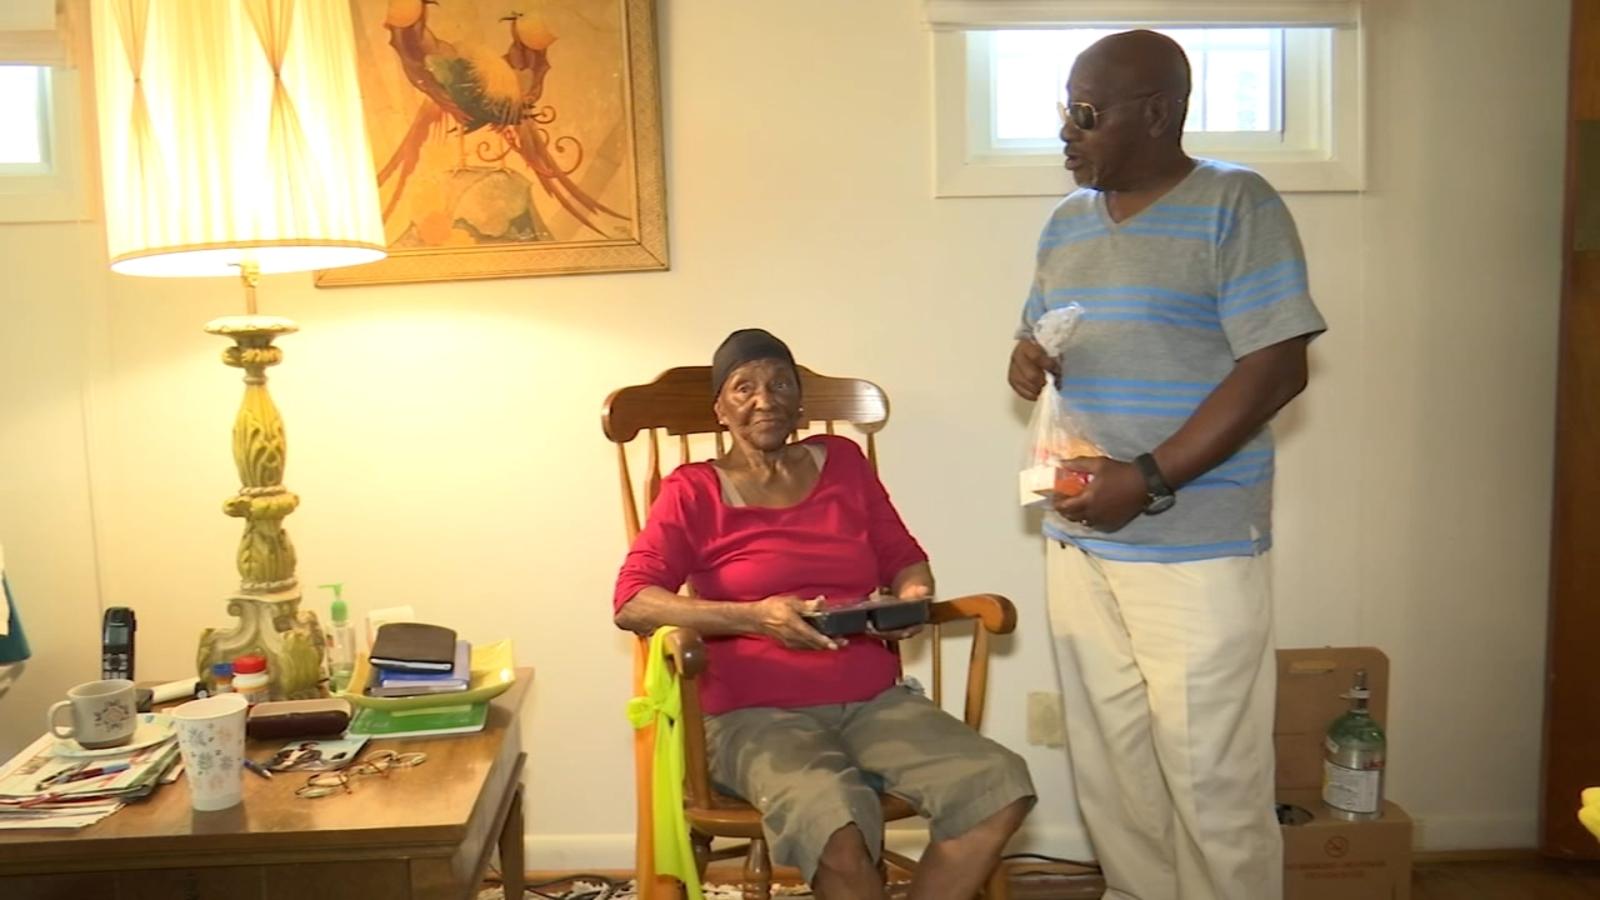 Cumberland County group ensures elderly are fed all week as Hurricane Dorian nears